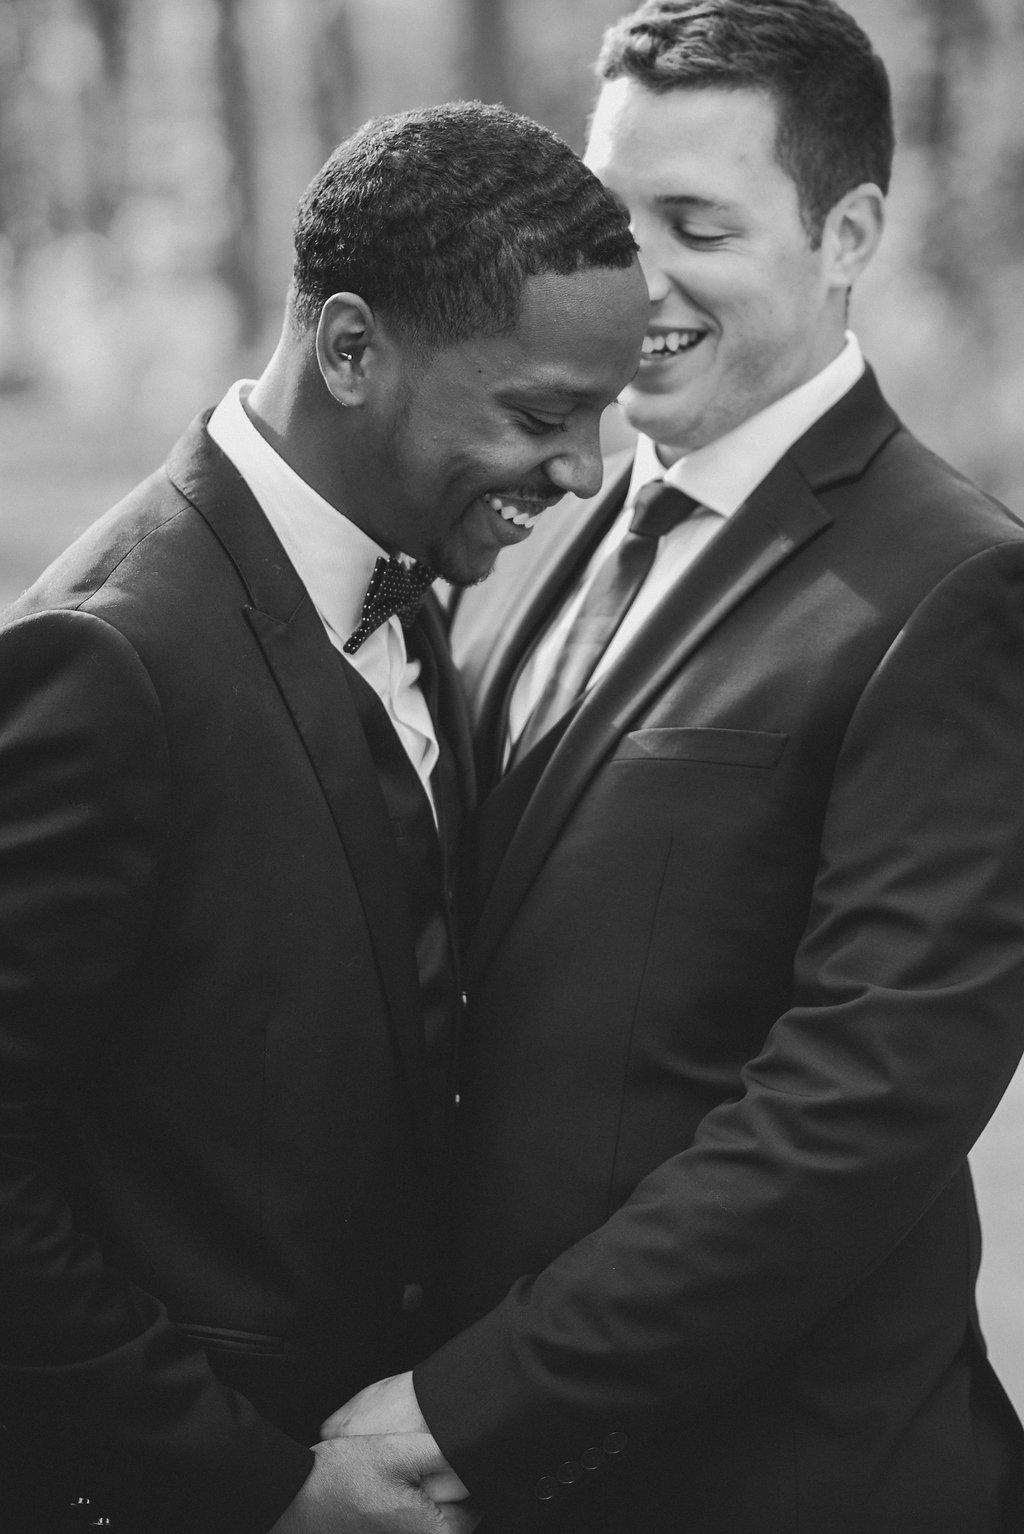 RiverClubofMequon-MequonWI-LGBT-Gay-StyledShoot-21-Copy1.jpg